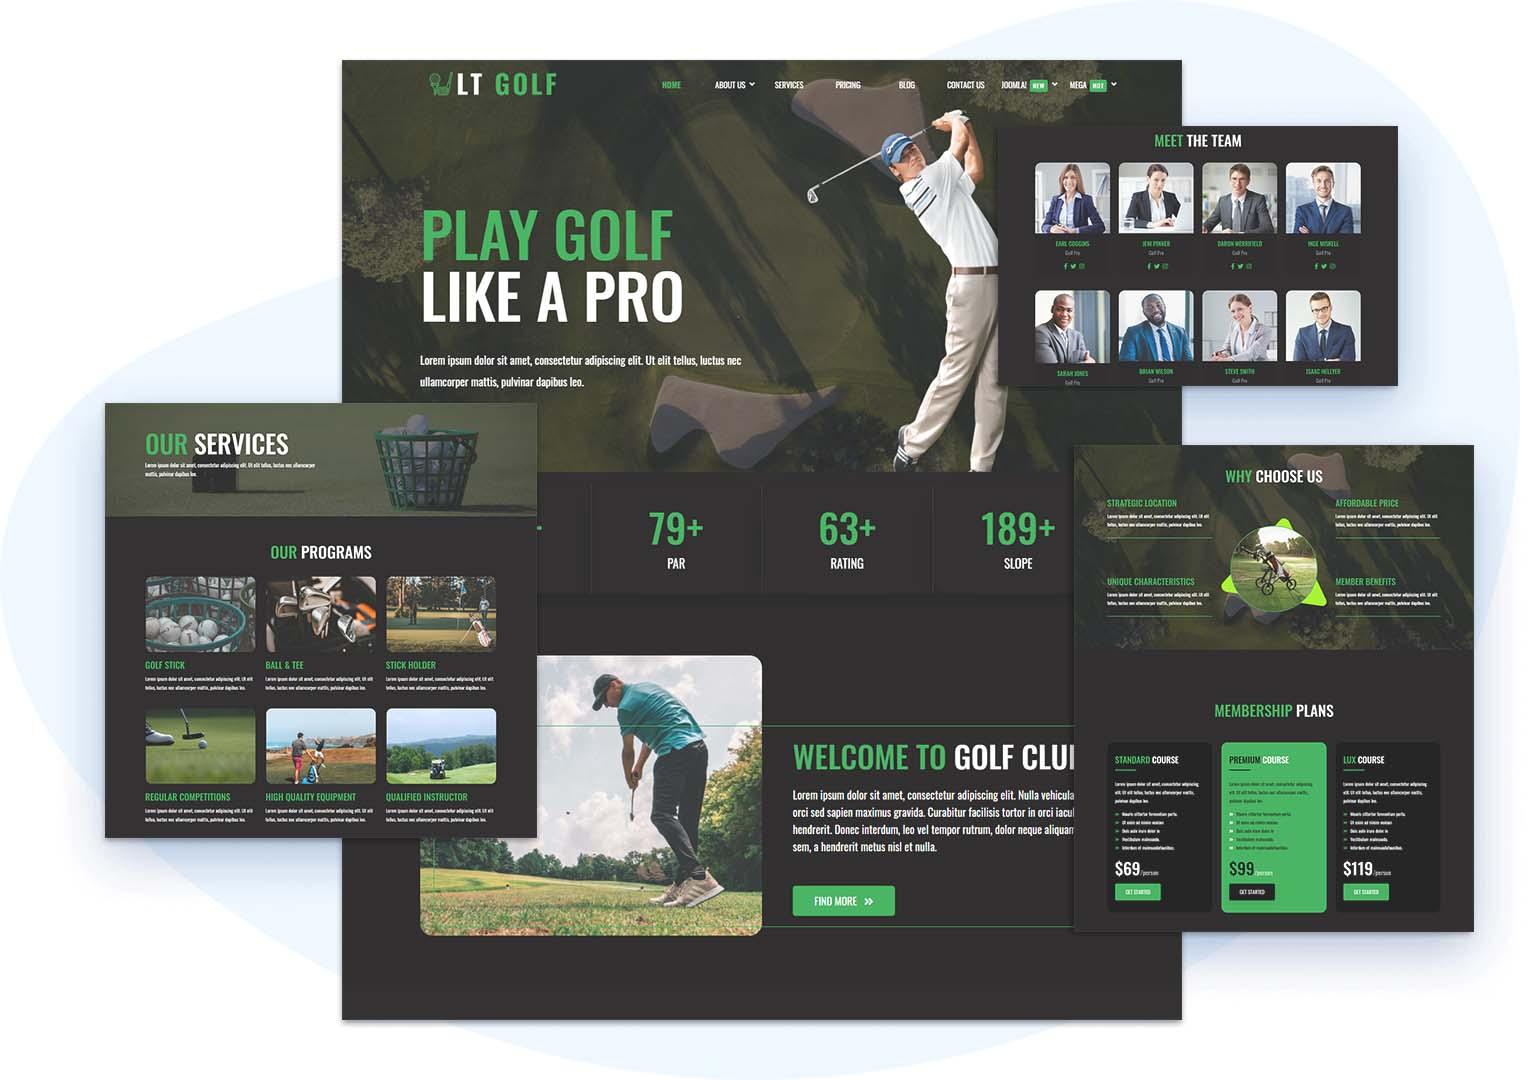 lt-golf-free-responsive-joomla-template-home